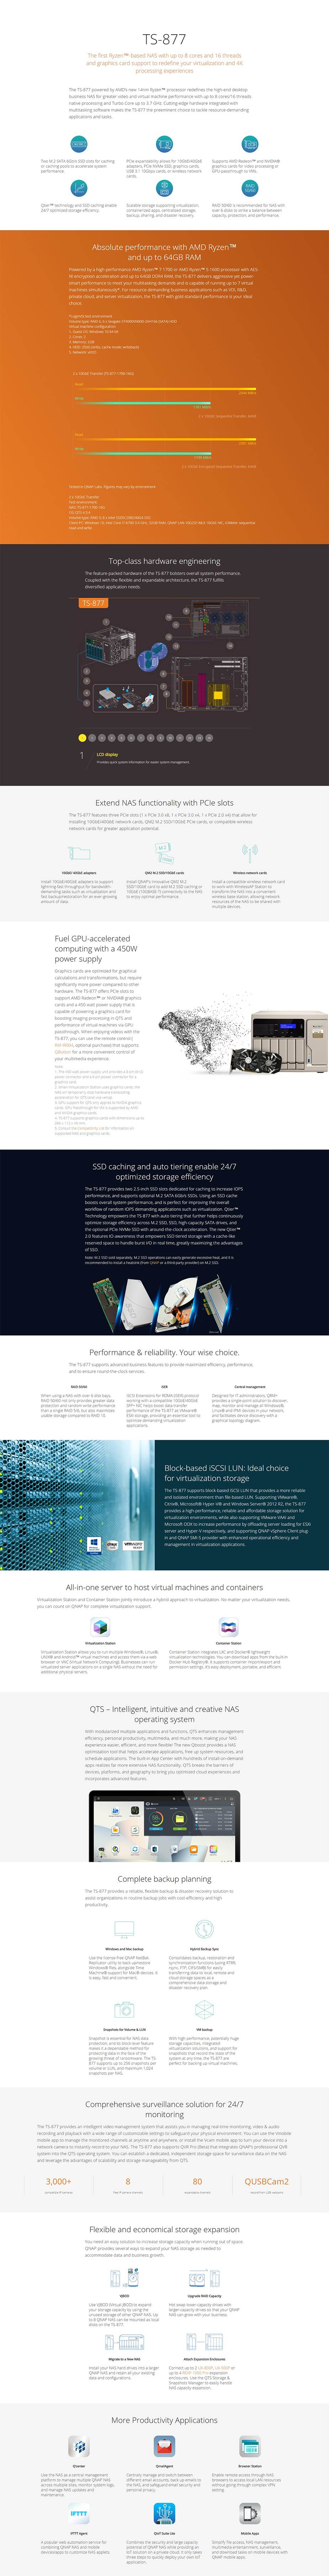 QNAP TS-877-1600-8G 8-Bay Diskless NAS - AMD Ryzen 5 1600 6-Core CPU 8GB - Desktop Overview 1